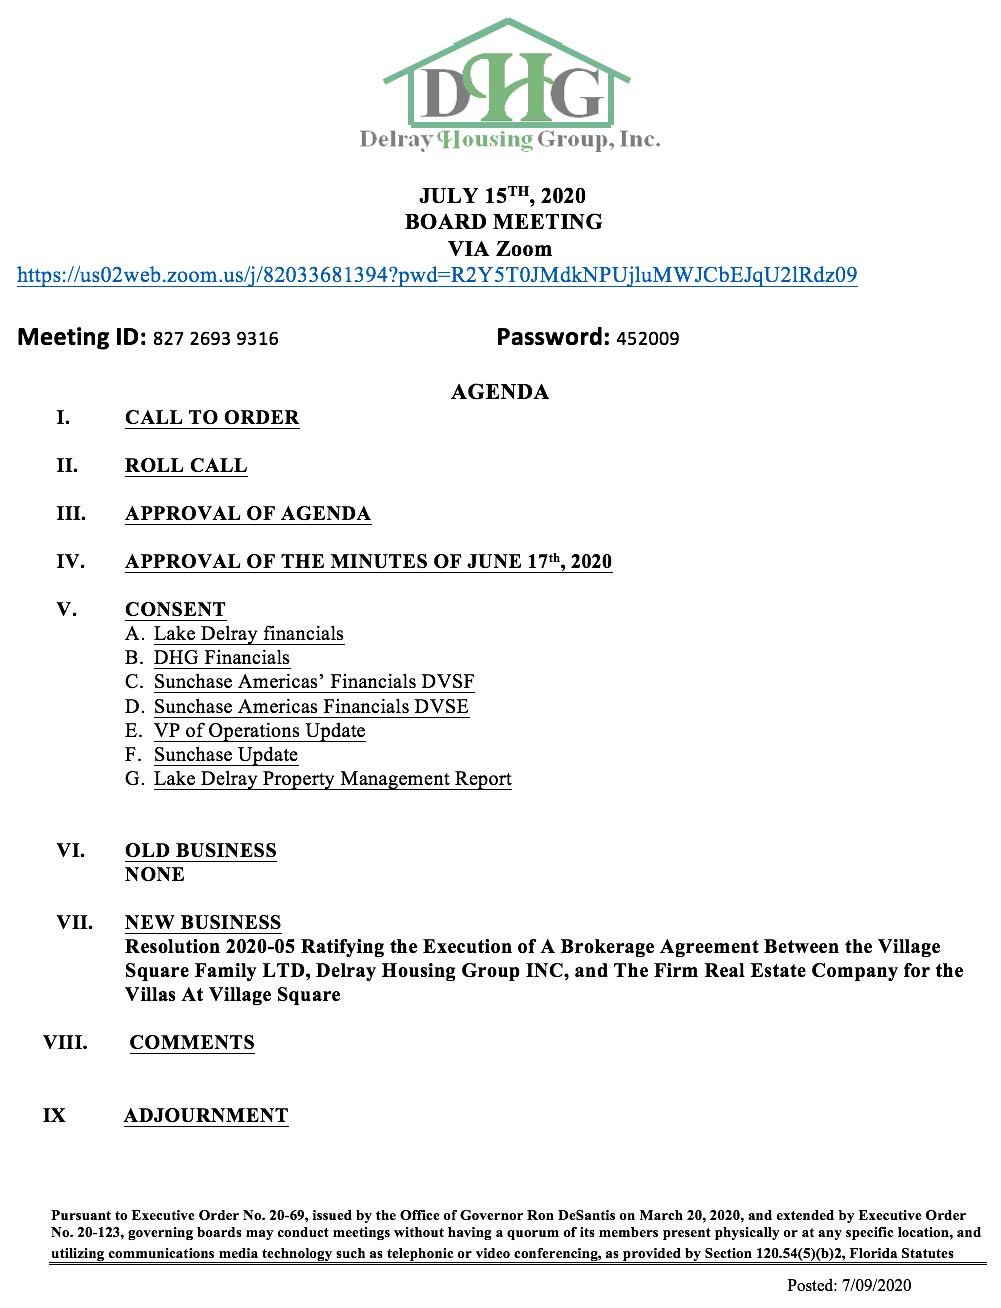 Agenda - Board Meeting - Jul 15th, 2020